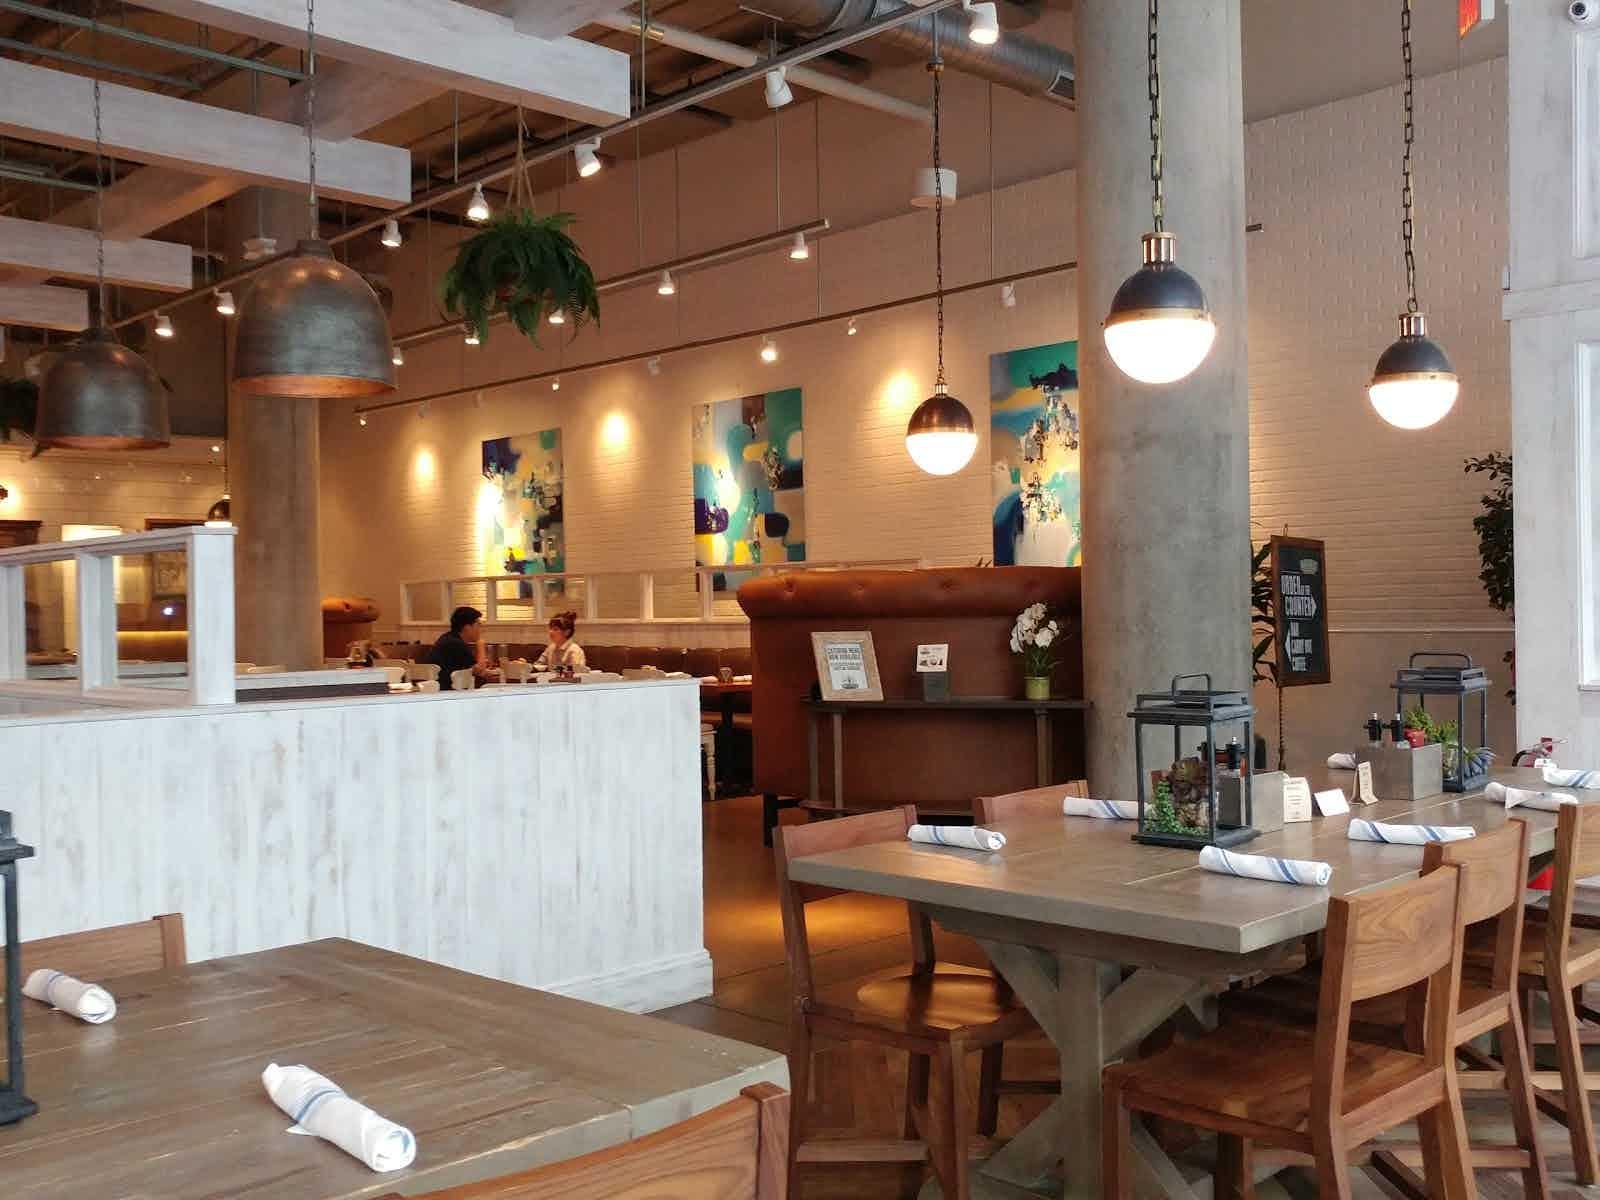 Maplewood kitchen and bar cincinnati restaurant review zagat